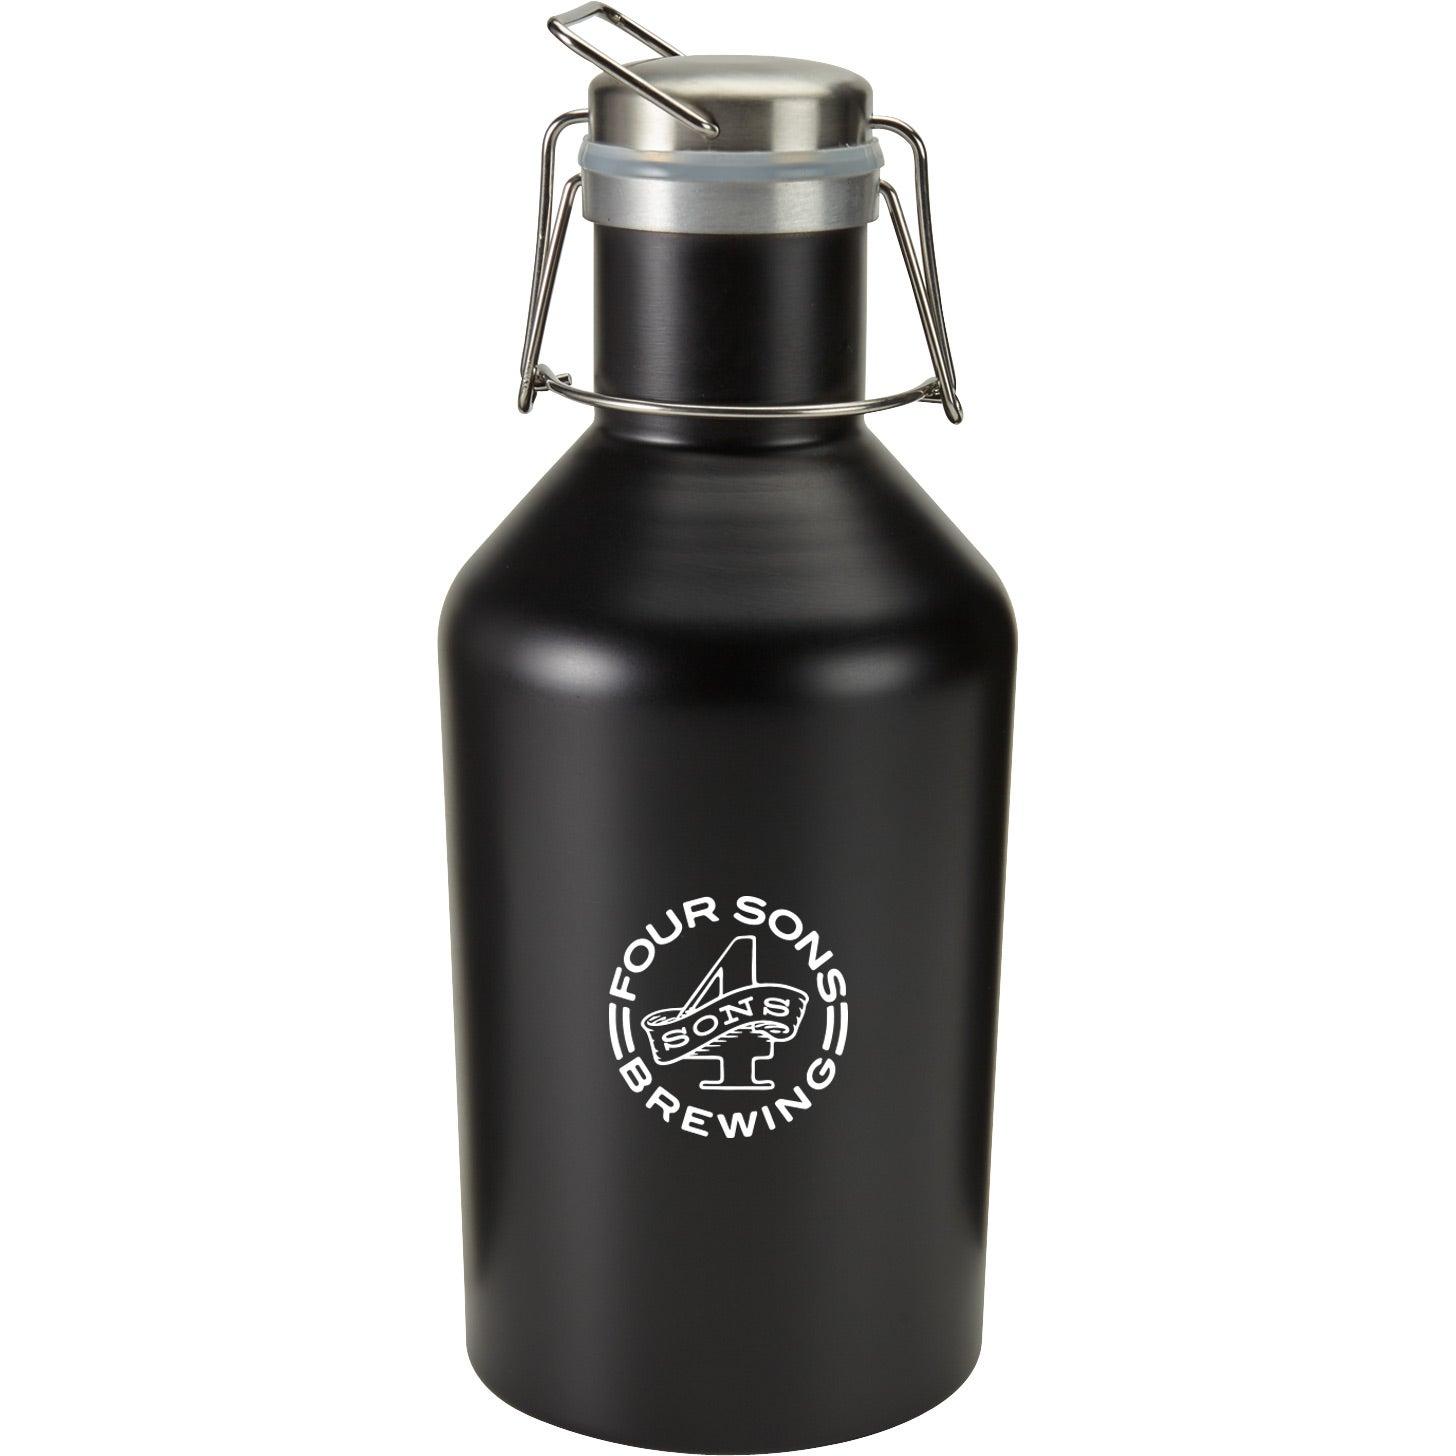 Stainless Steel BPA Free Growler (64 Oz.)